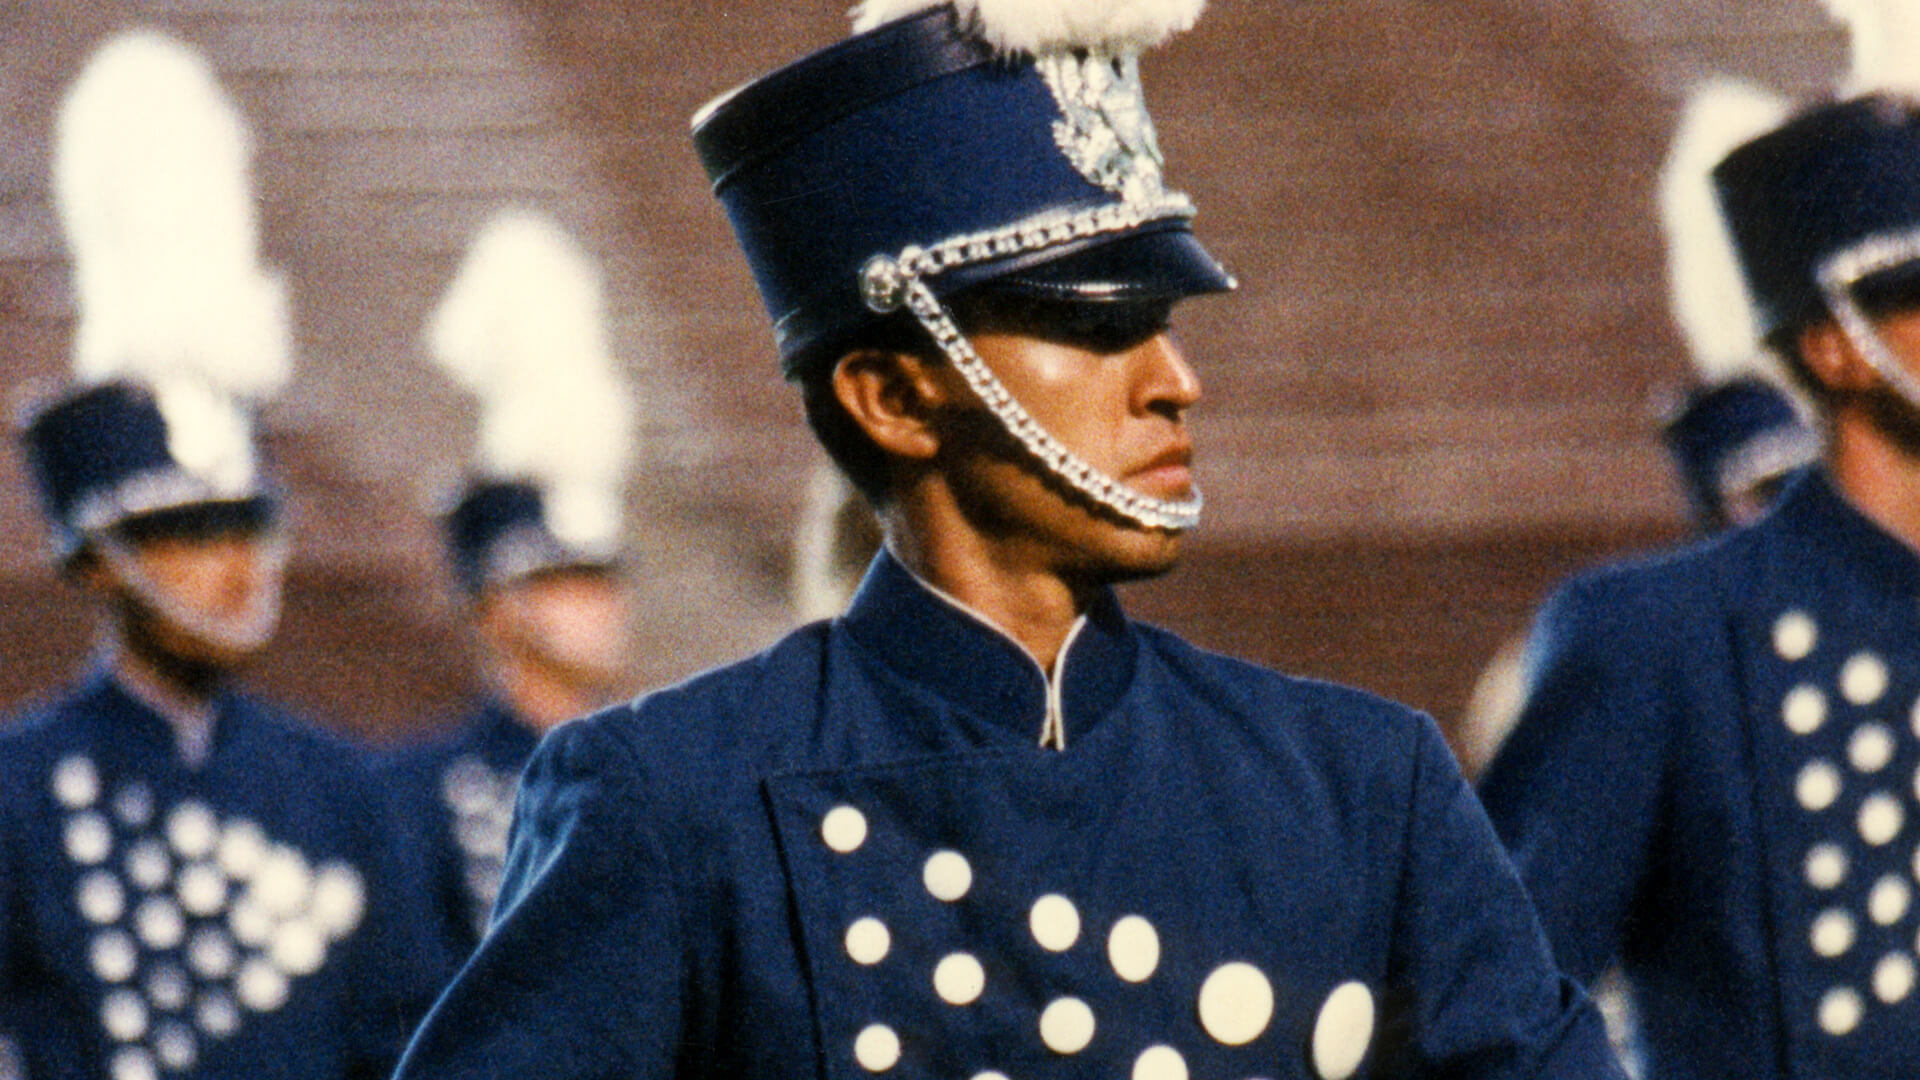 Spotlight of the Week: 1996 Blue Knights